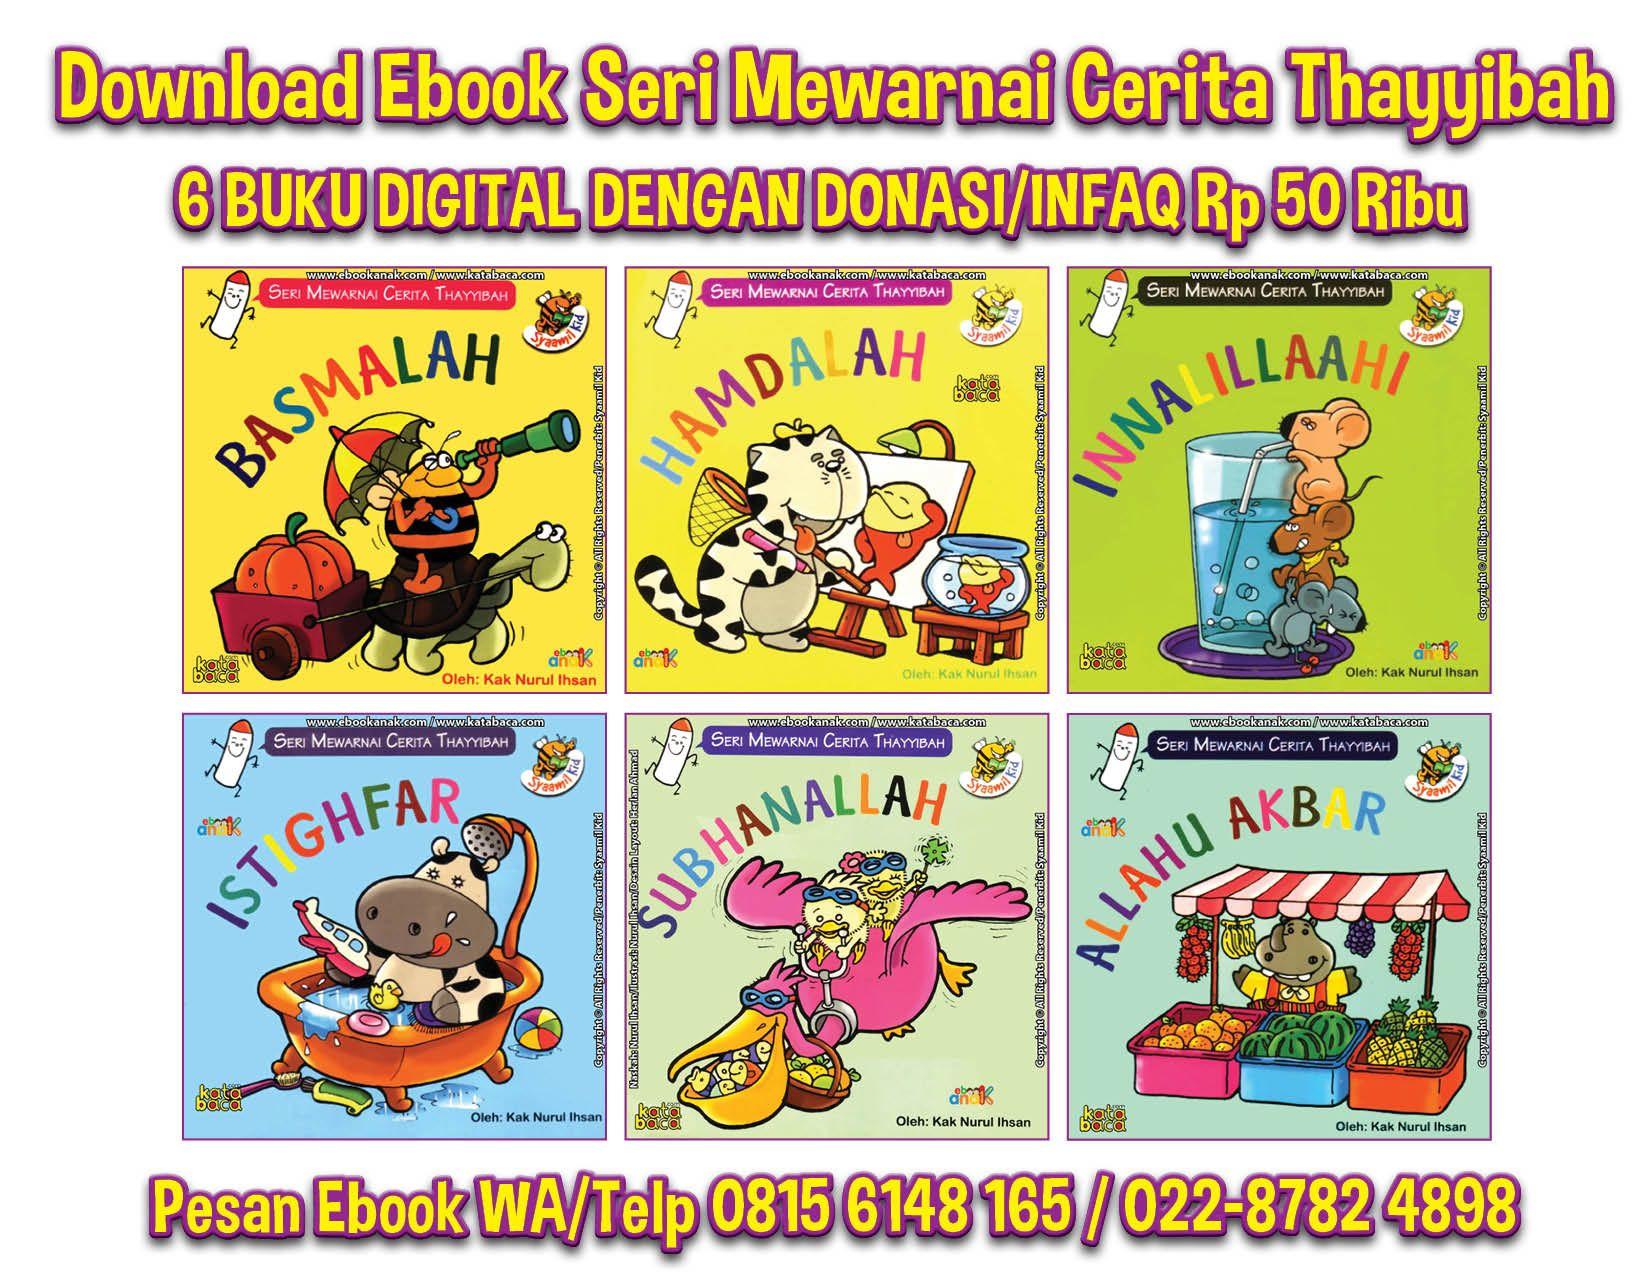 Download Ebook Seri Mewarnai Cerita Thayyibah Burung